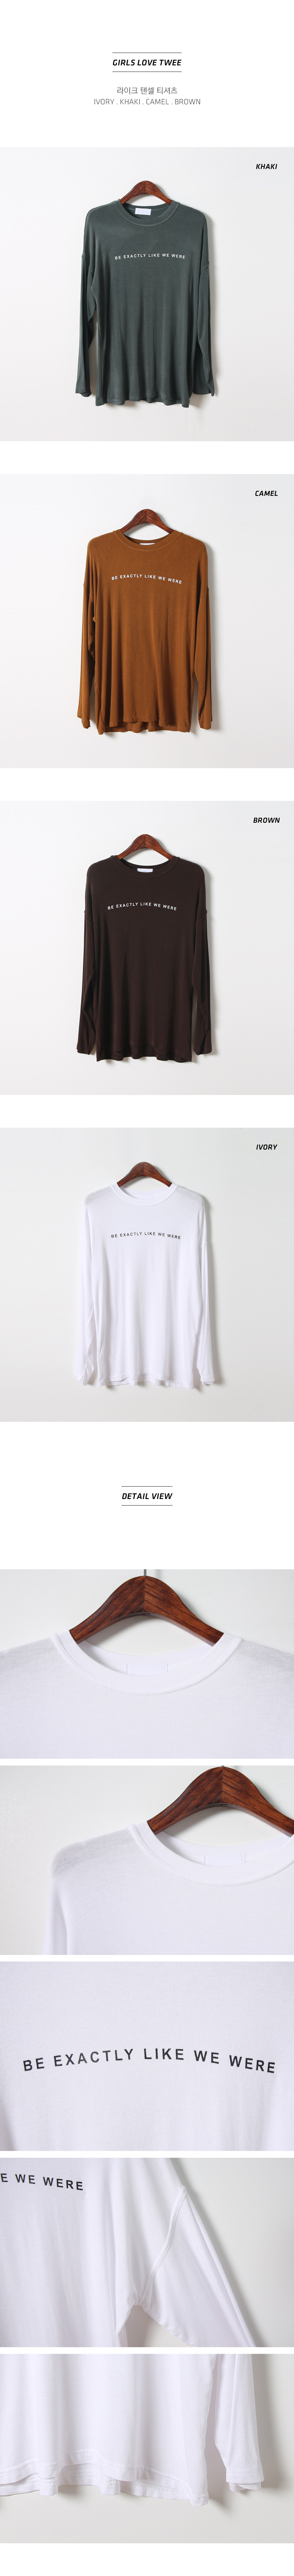 Like TENCEL T-shirt